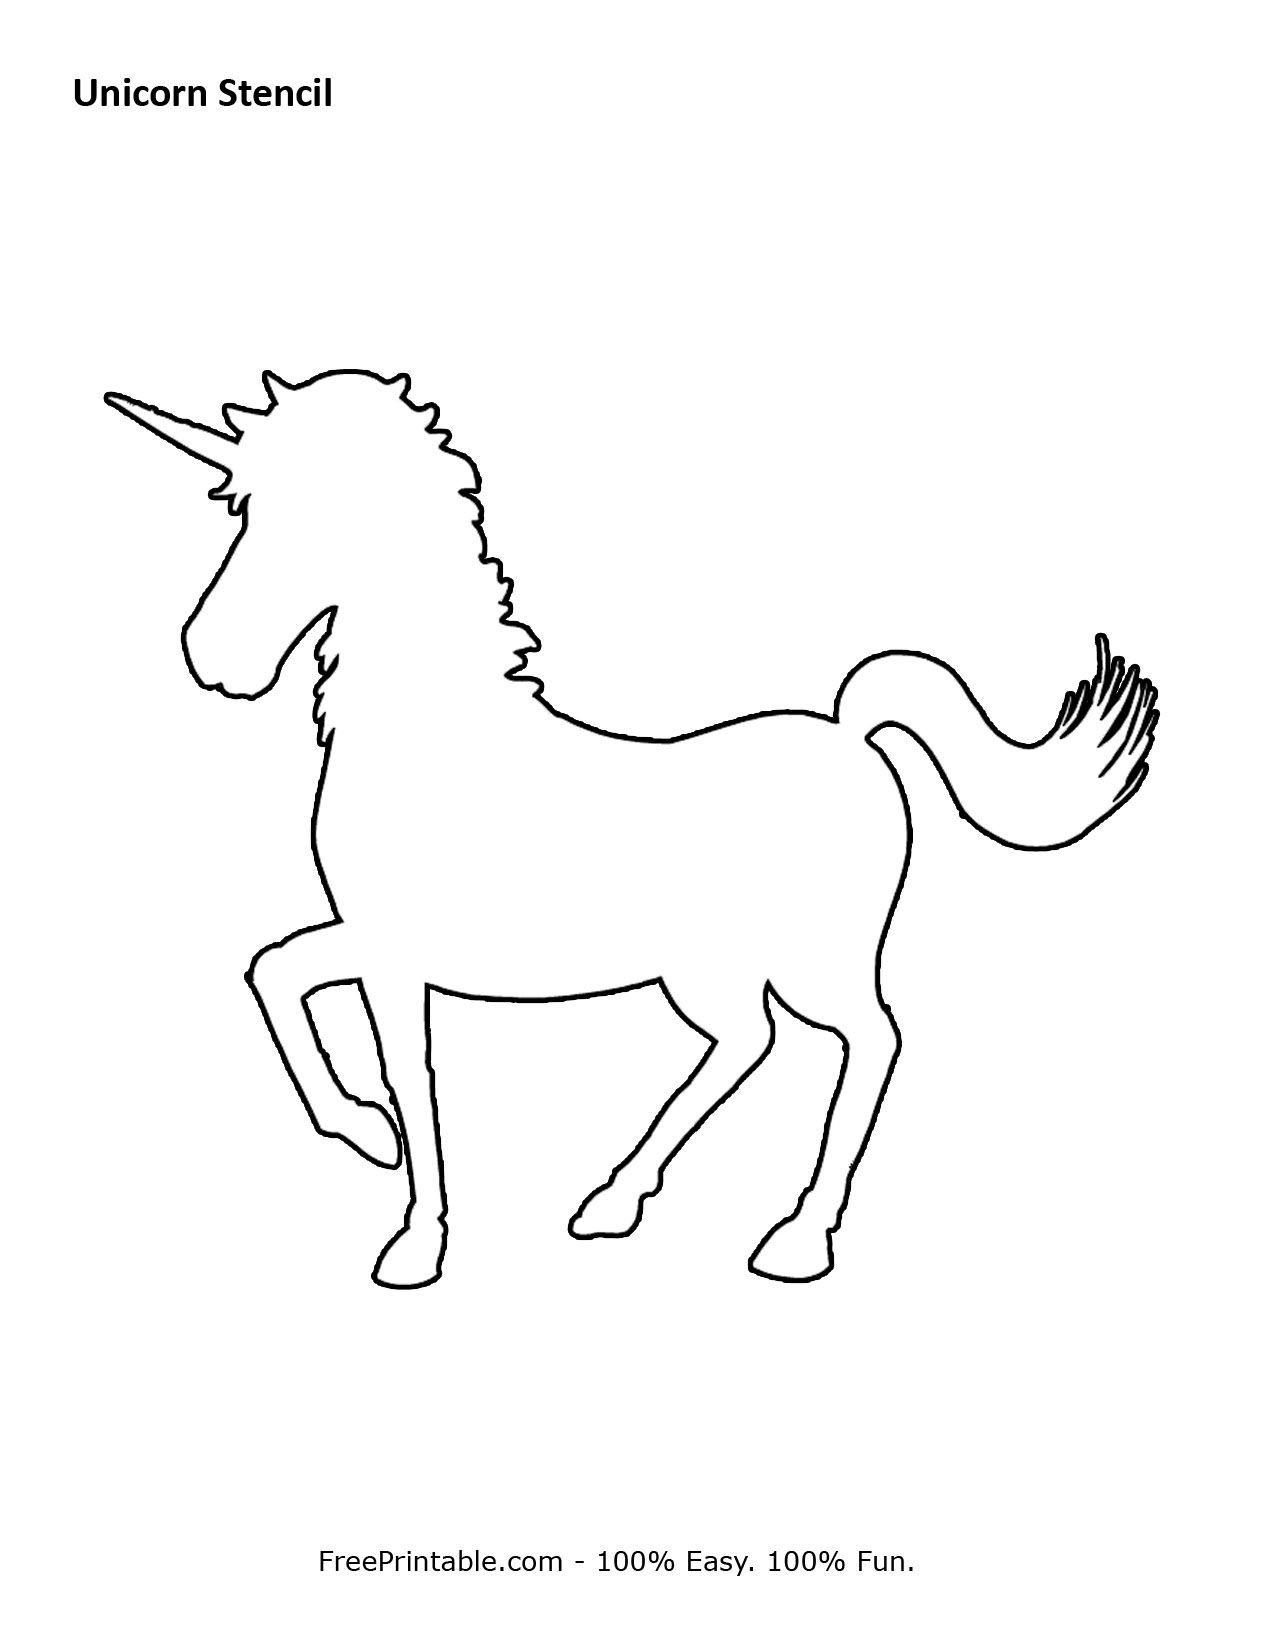 Customize Your Free Printable Unicorn Stencil